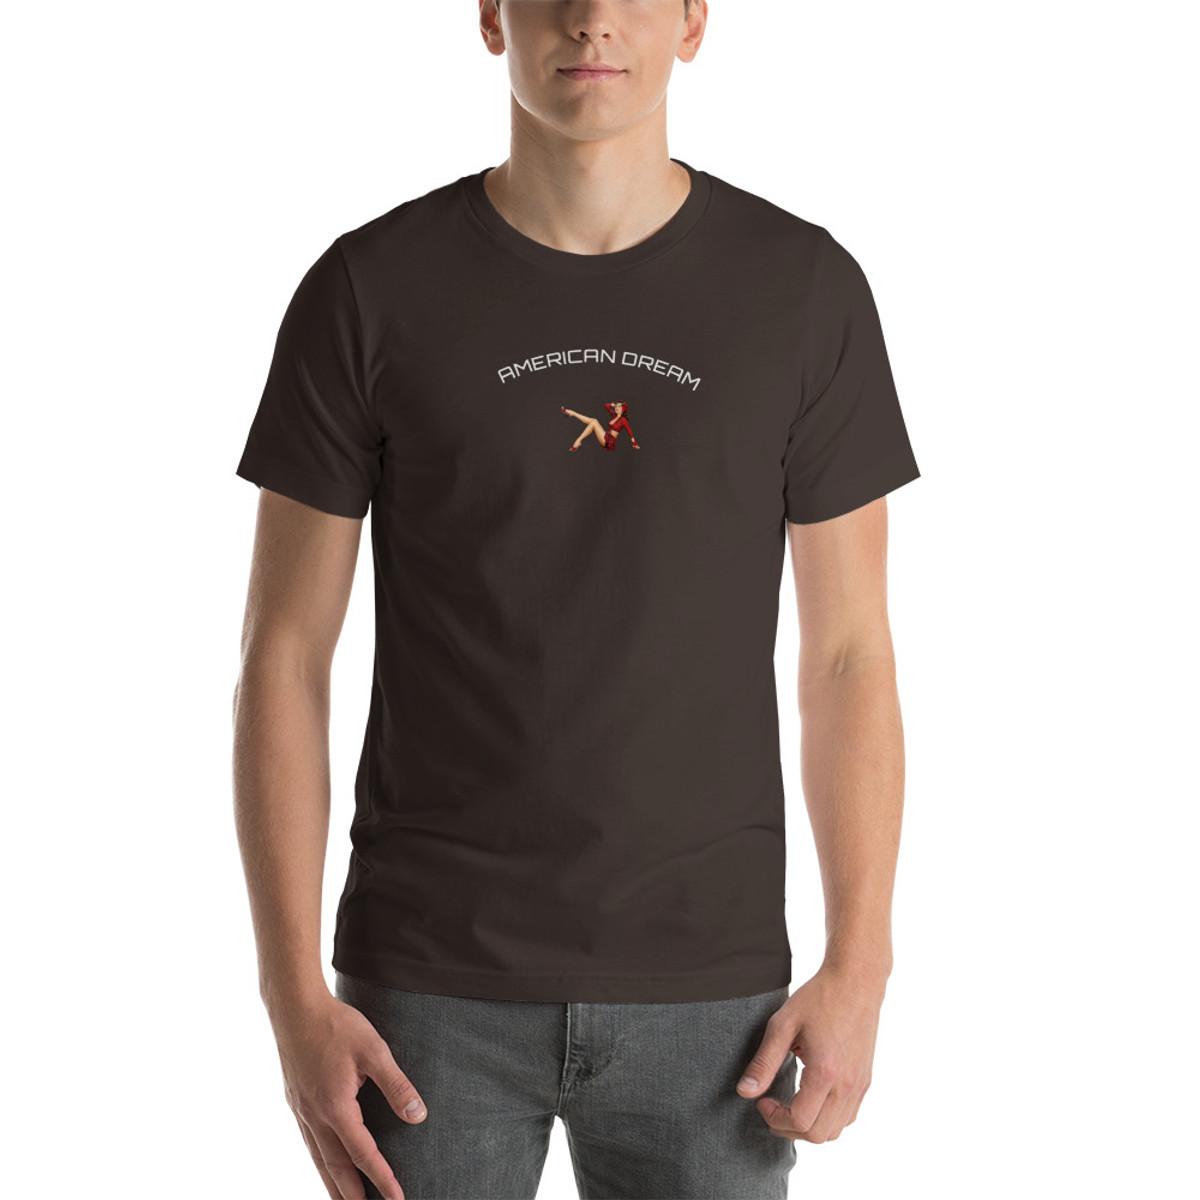 Short-Sleeve Unisex T-Shirt AMDM